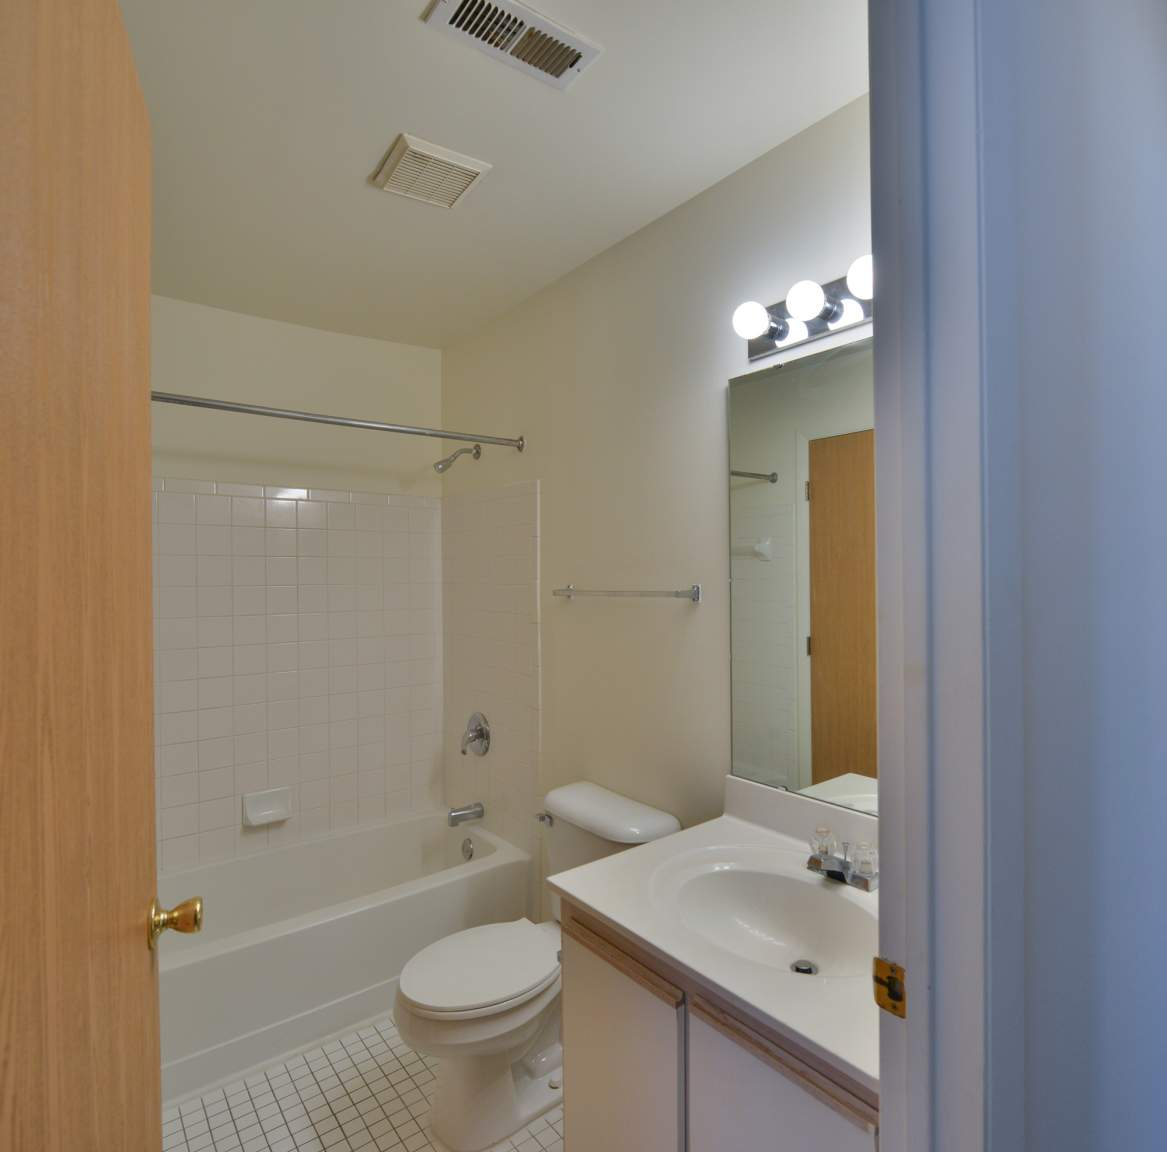 Sandhurst Apartments: Miller-Valentine Residential Property